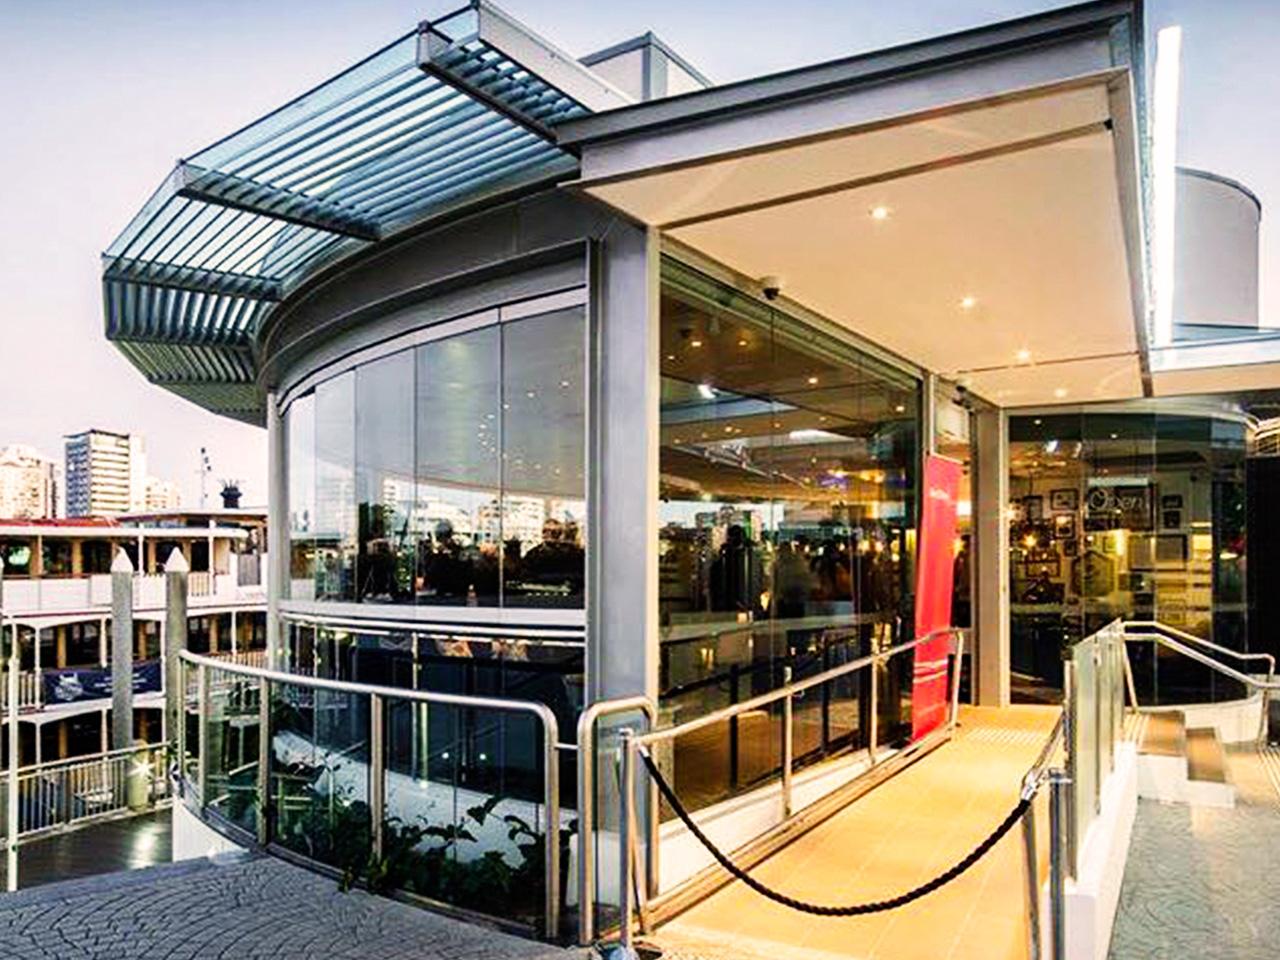 Riverbar venue entrance with glass walls